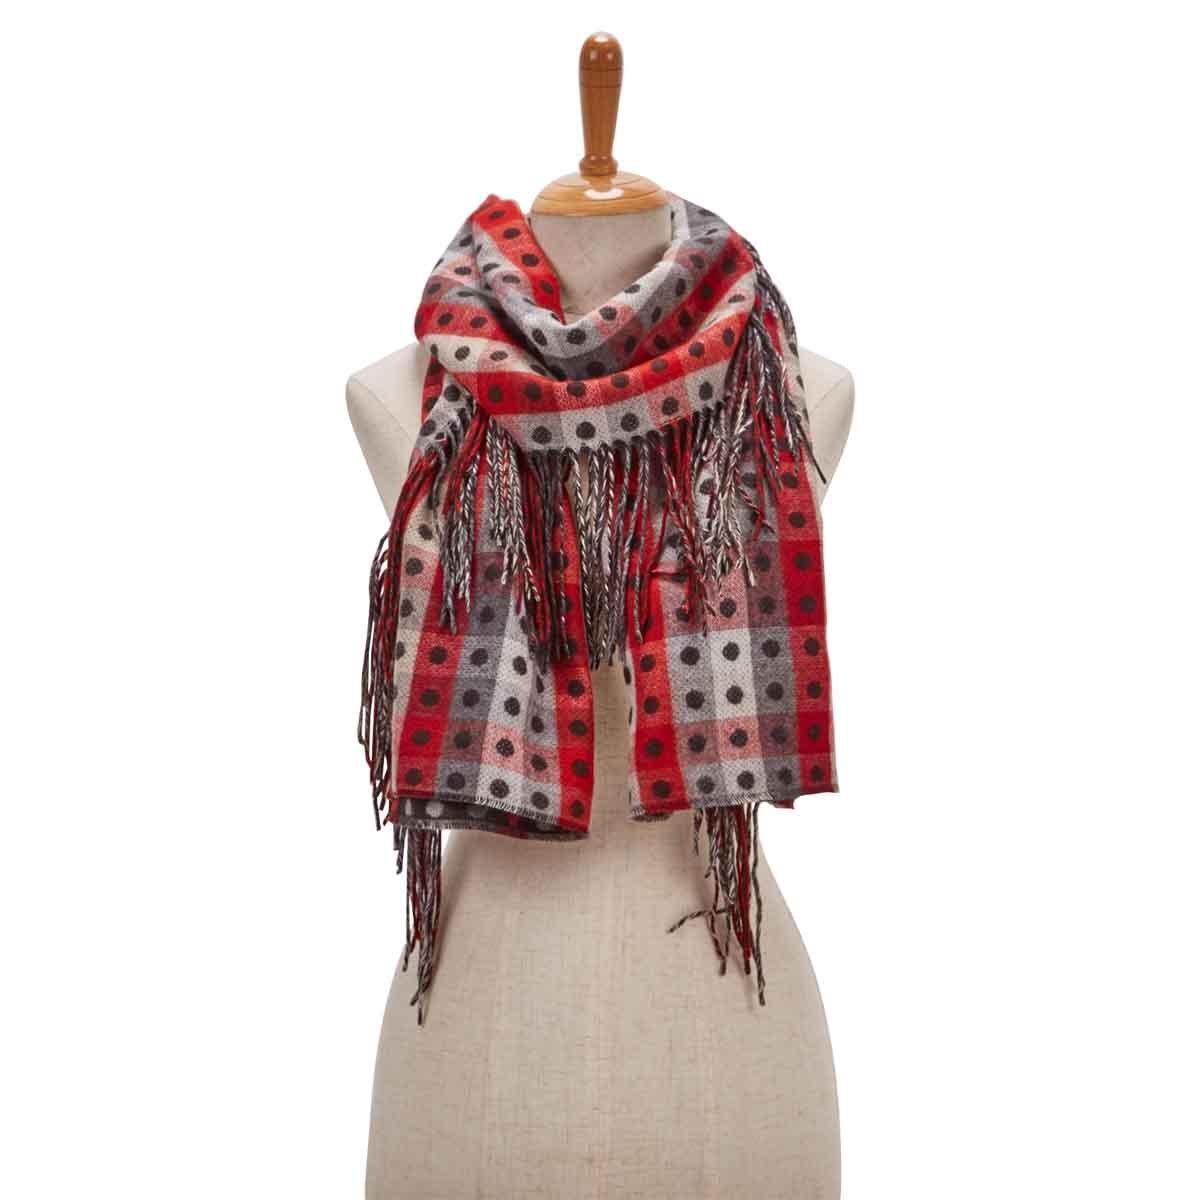 Lds SideFringeColorBlock bk/wt/rd scarf